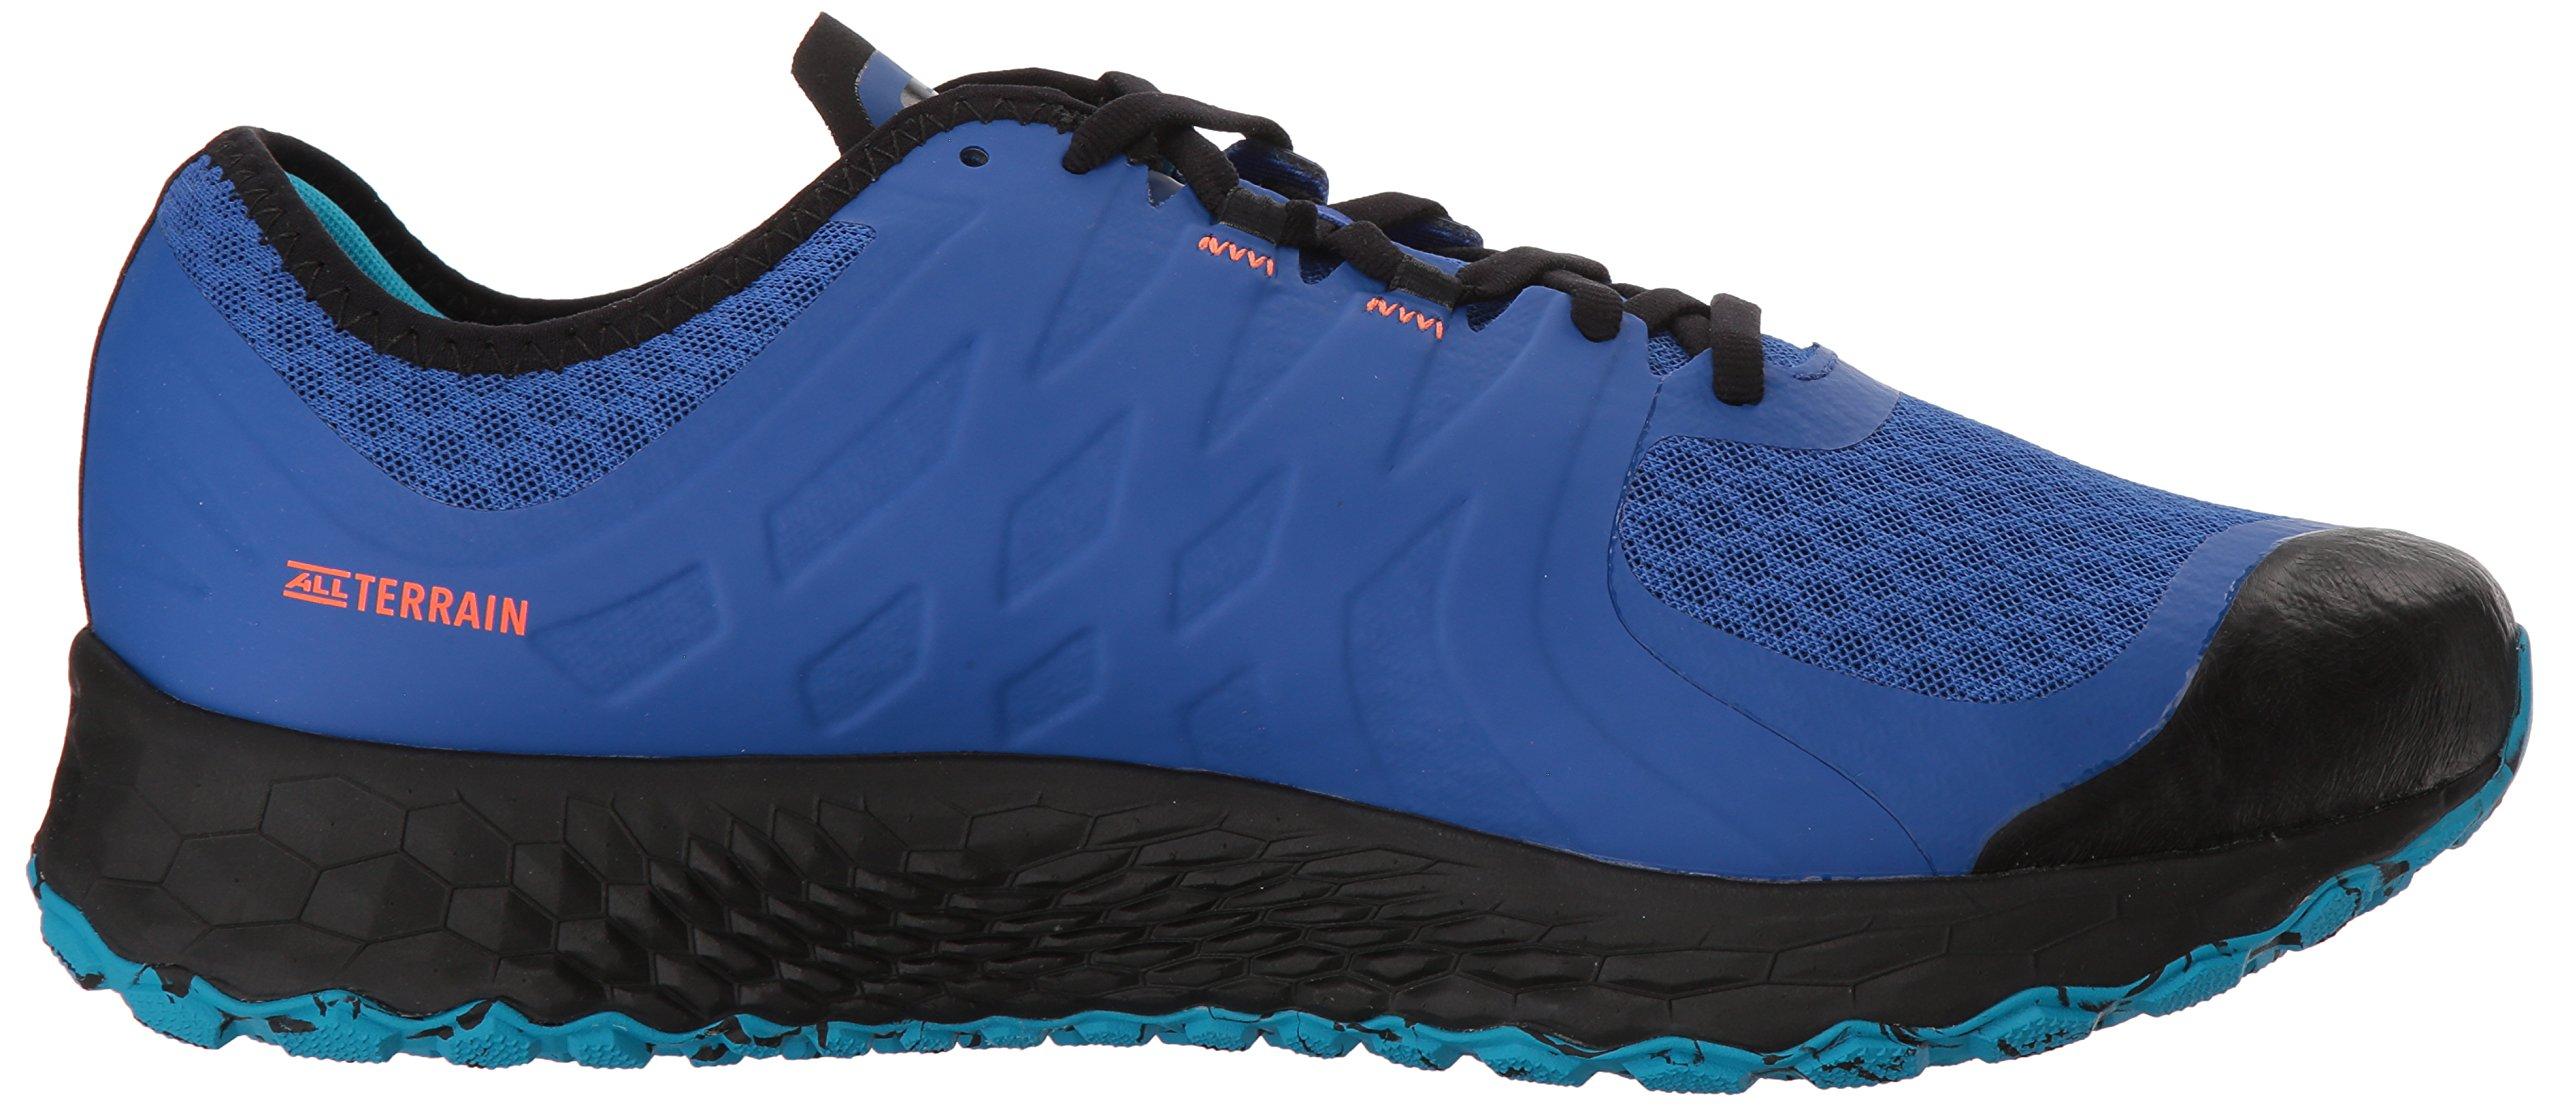 New Balance Men's Kaymin Trail v1 Fresh Foam Trail Running Shoe, Deep Pacific, 7 D US by New Balance (Image #6)